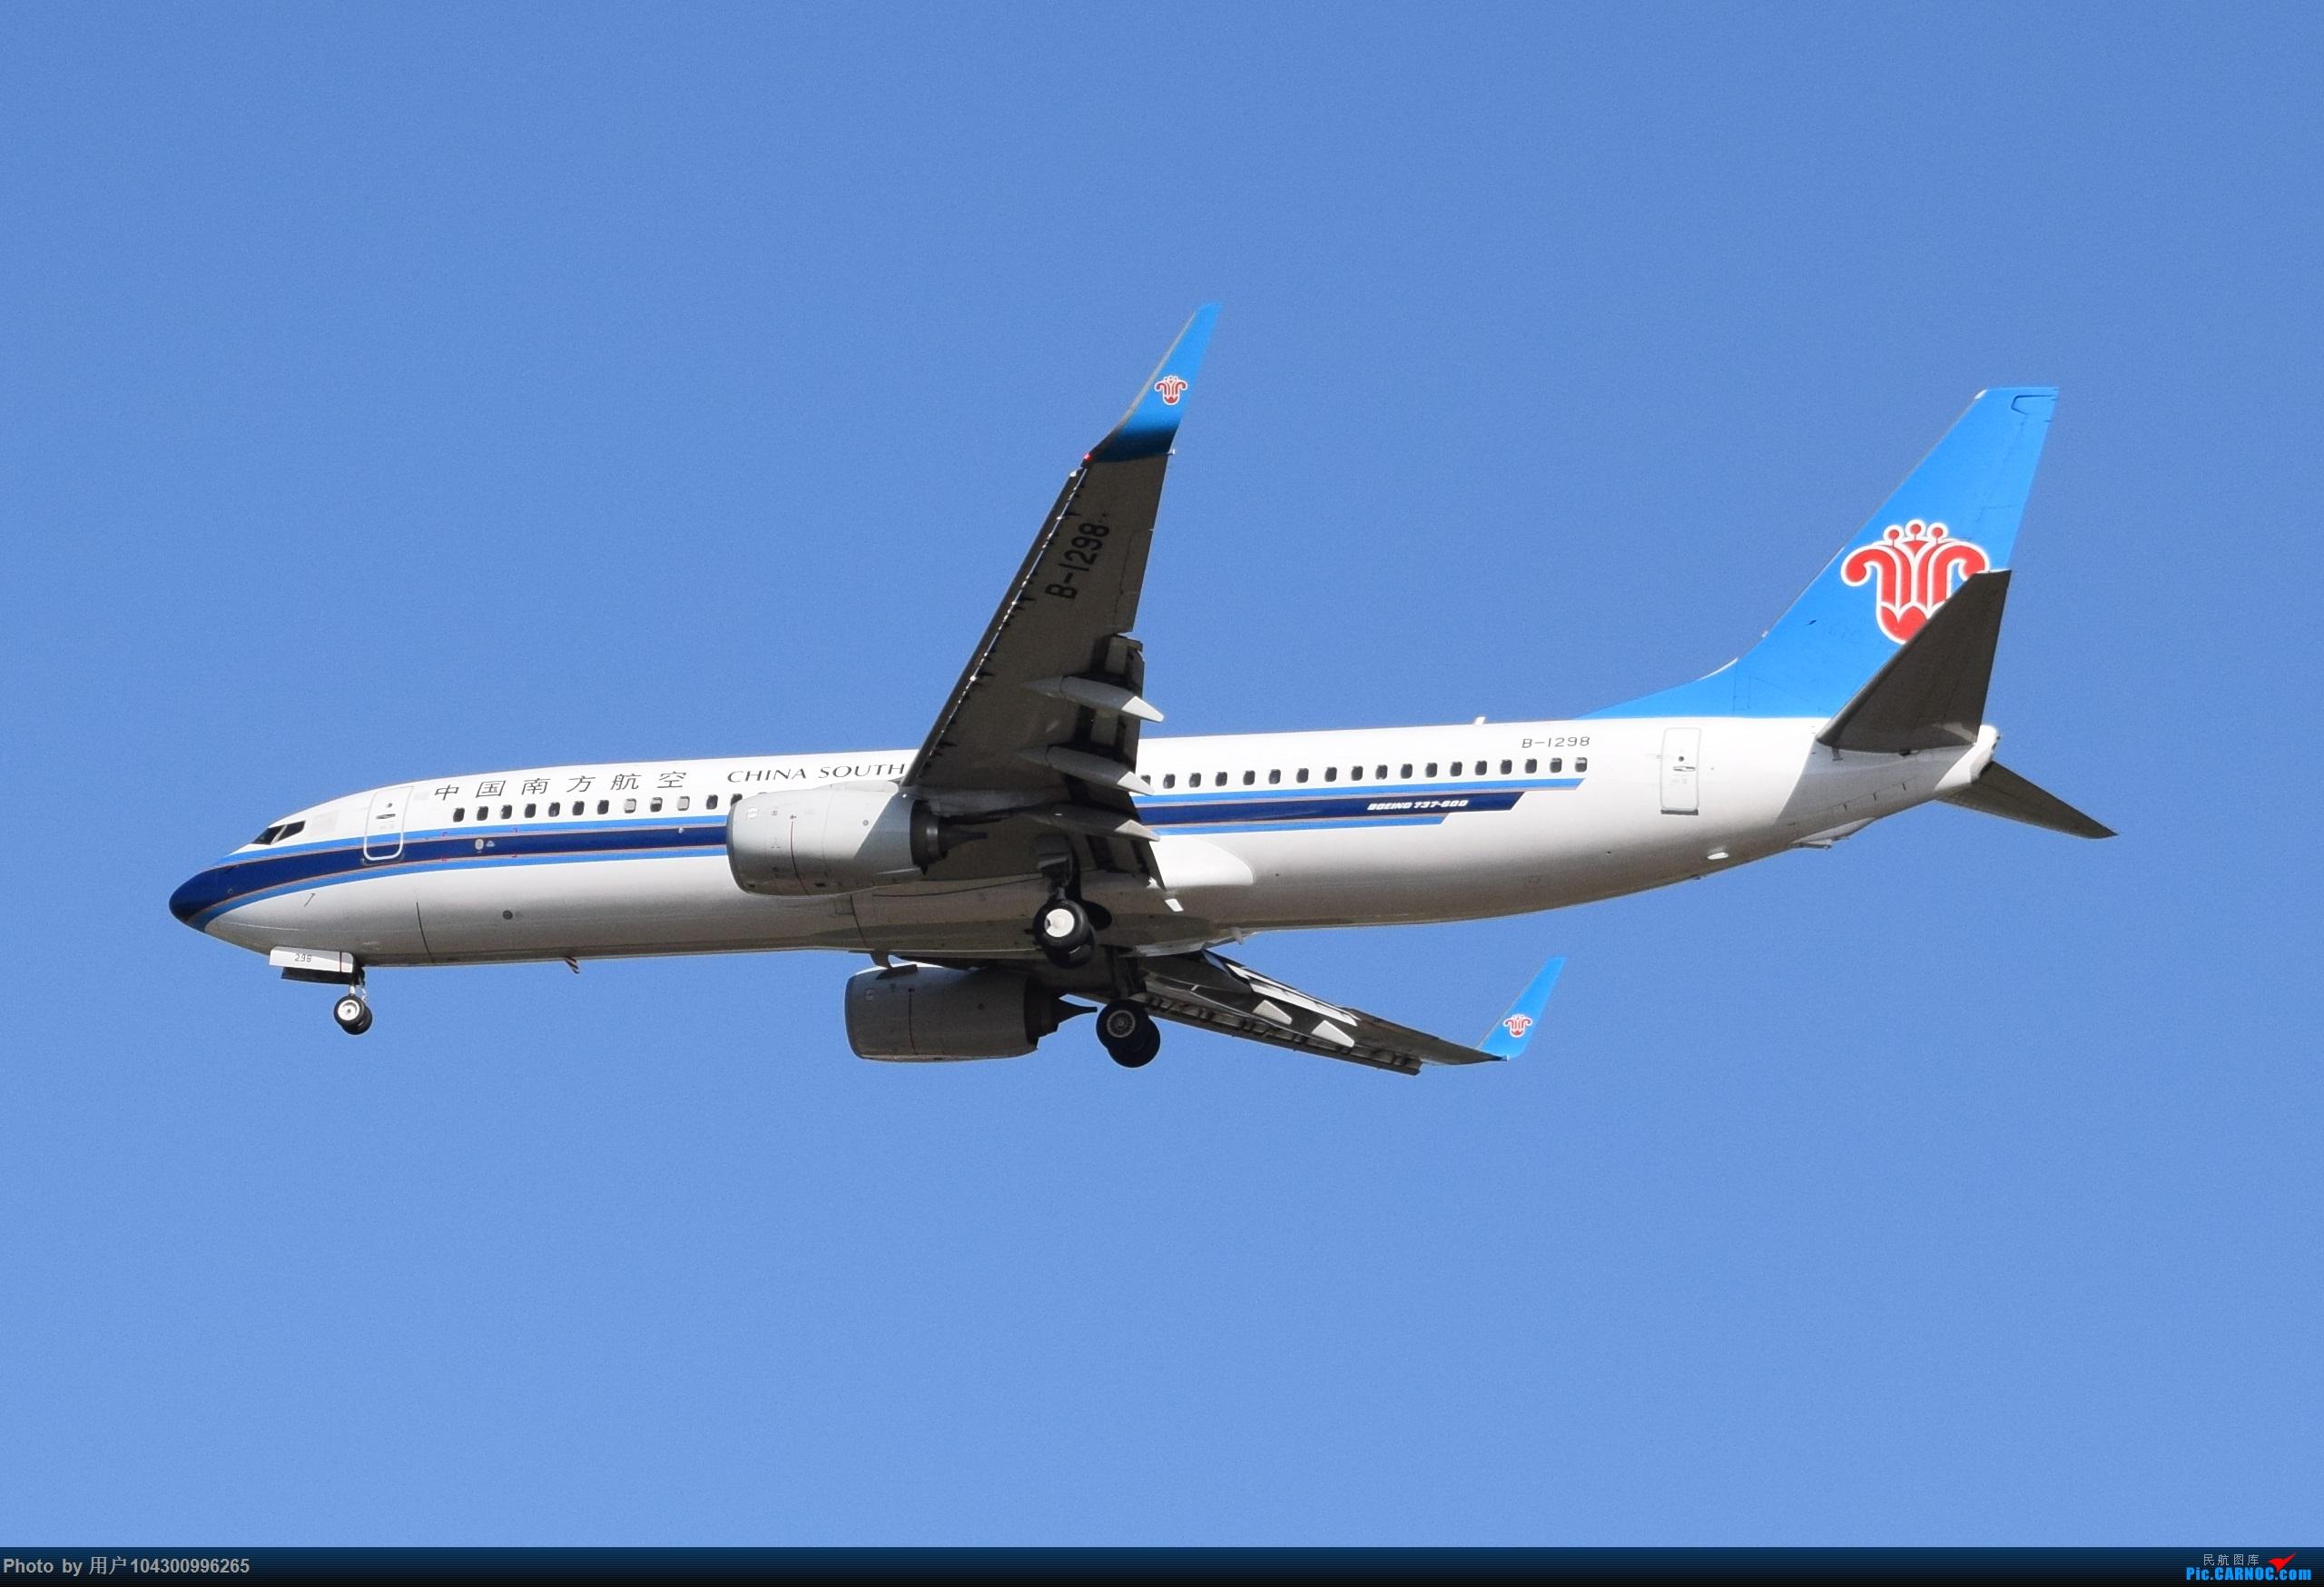 Re:[原创][KWE]贵阳今天天气不错,随便拍几张! BOEING 737-800 B-1298 中国贵阳龙洞堡国际机场